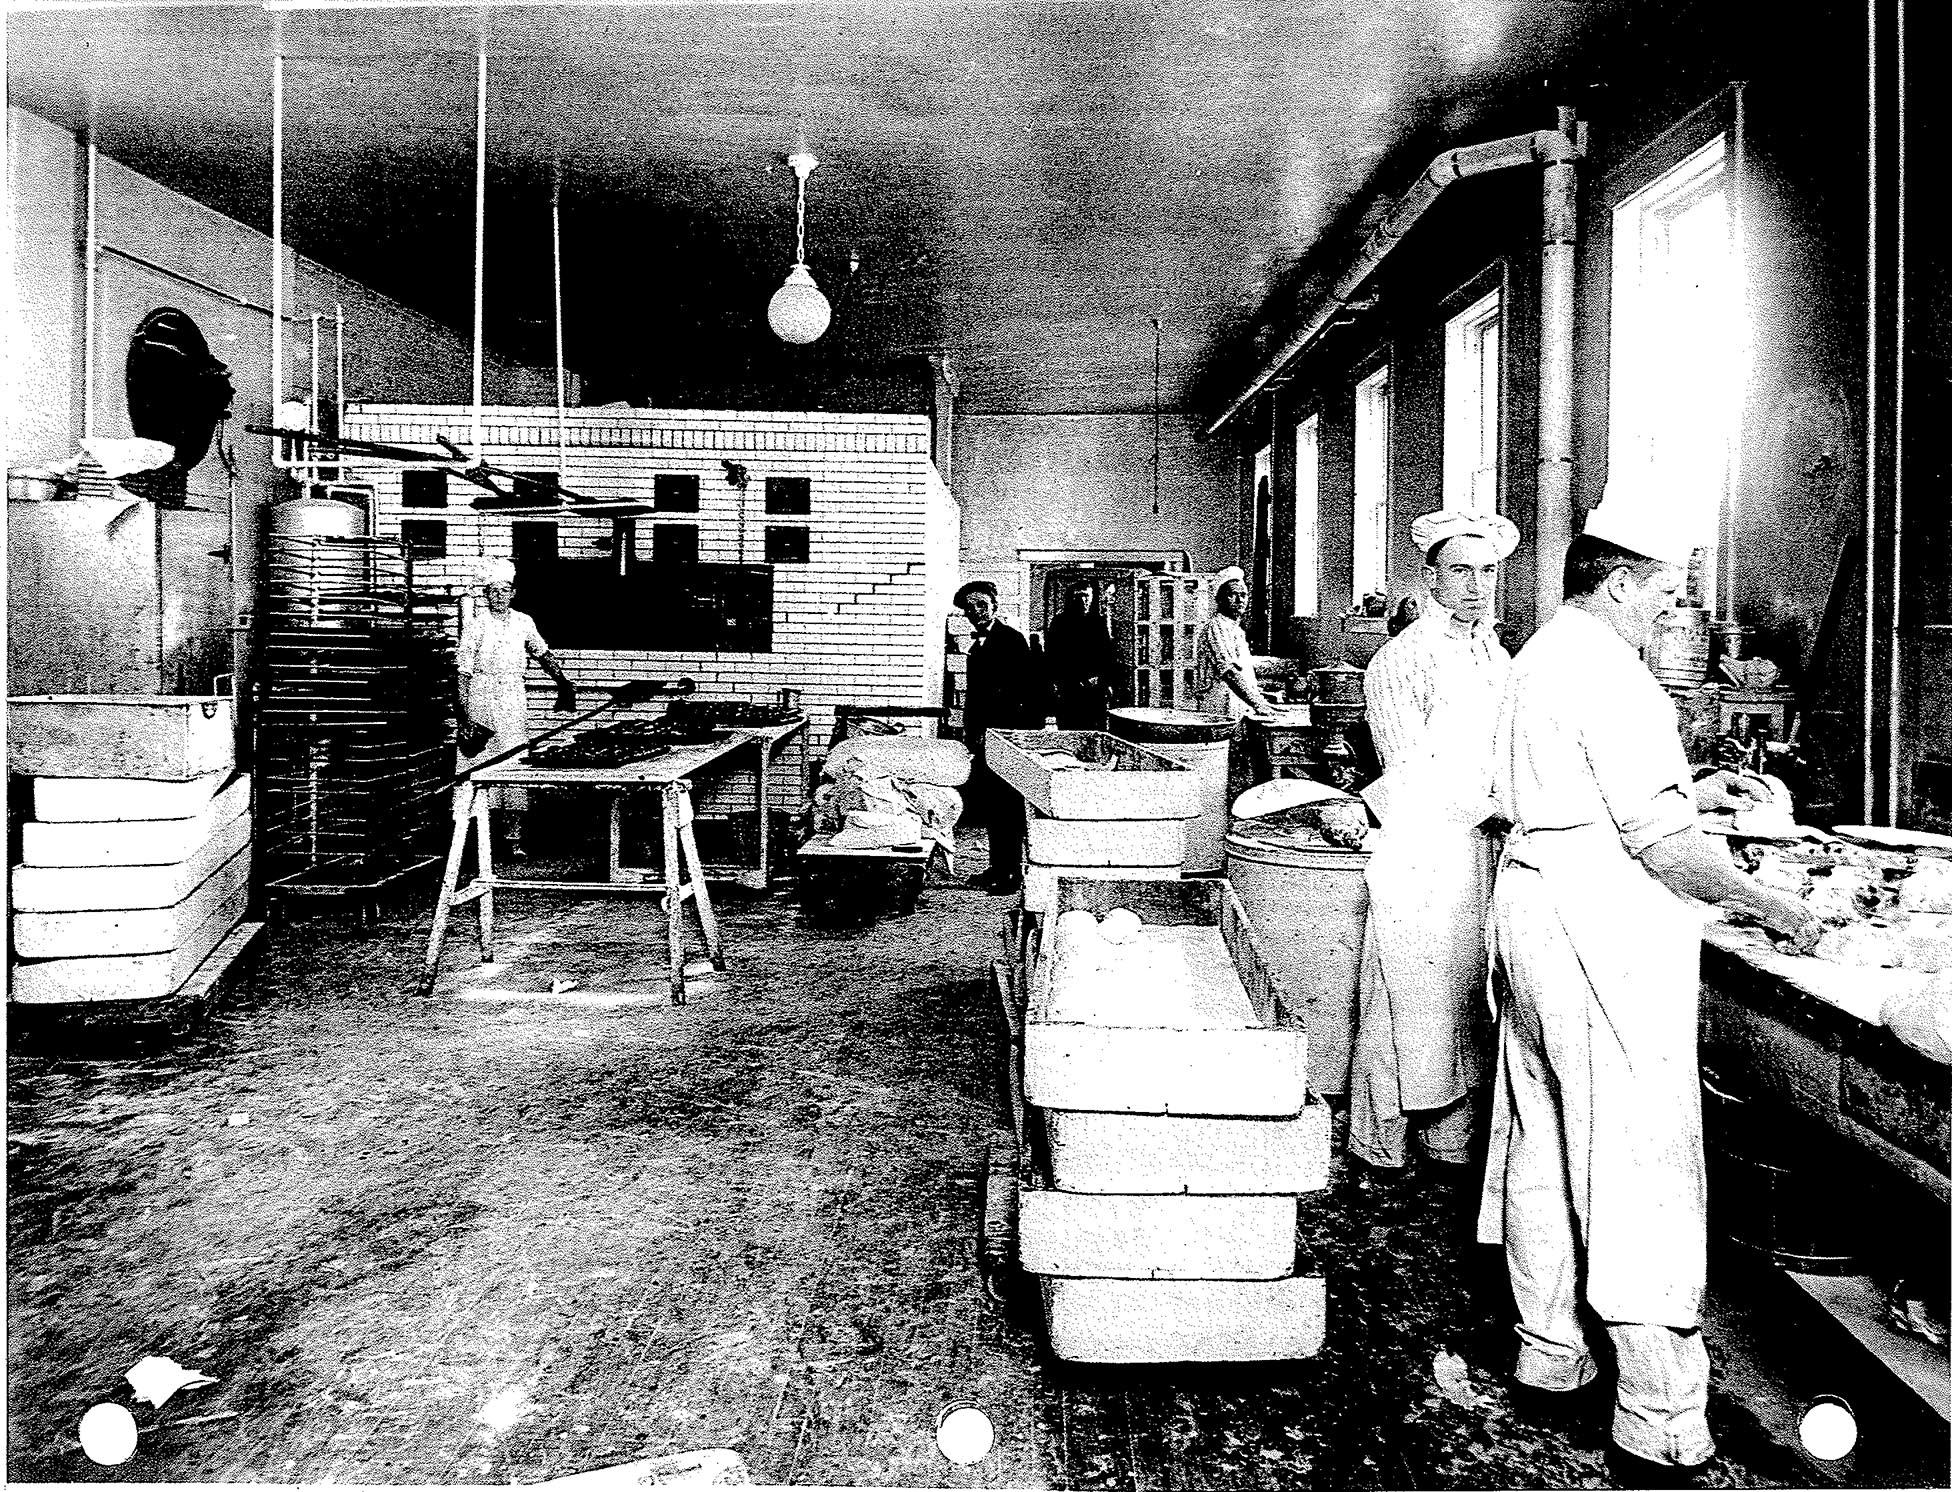 history 1966 Ford Unibody Truck busy workers at the new bakery ca 1917 from left tony janezich sam lagges tony kozar javo radakovich john maurine and august bratulich